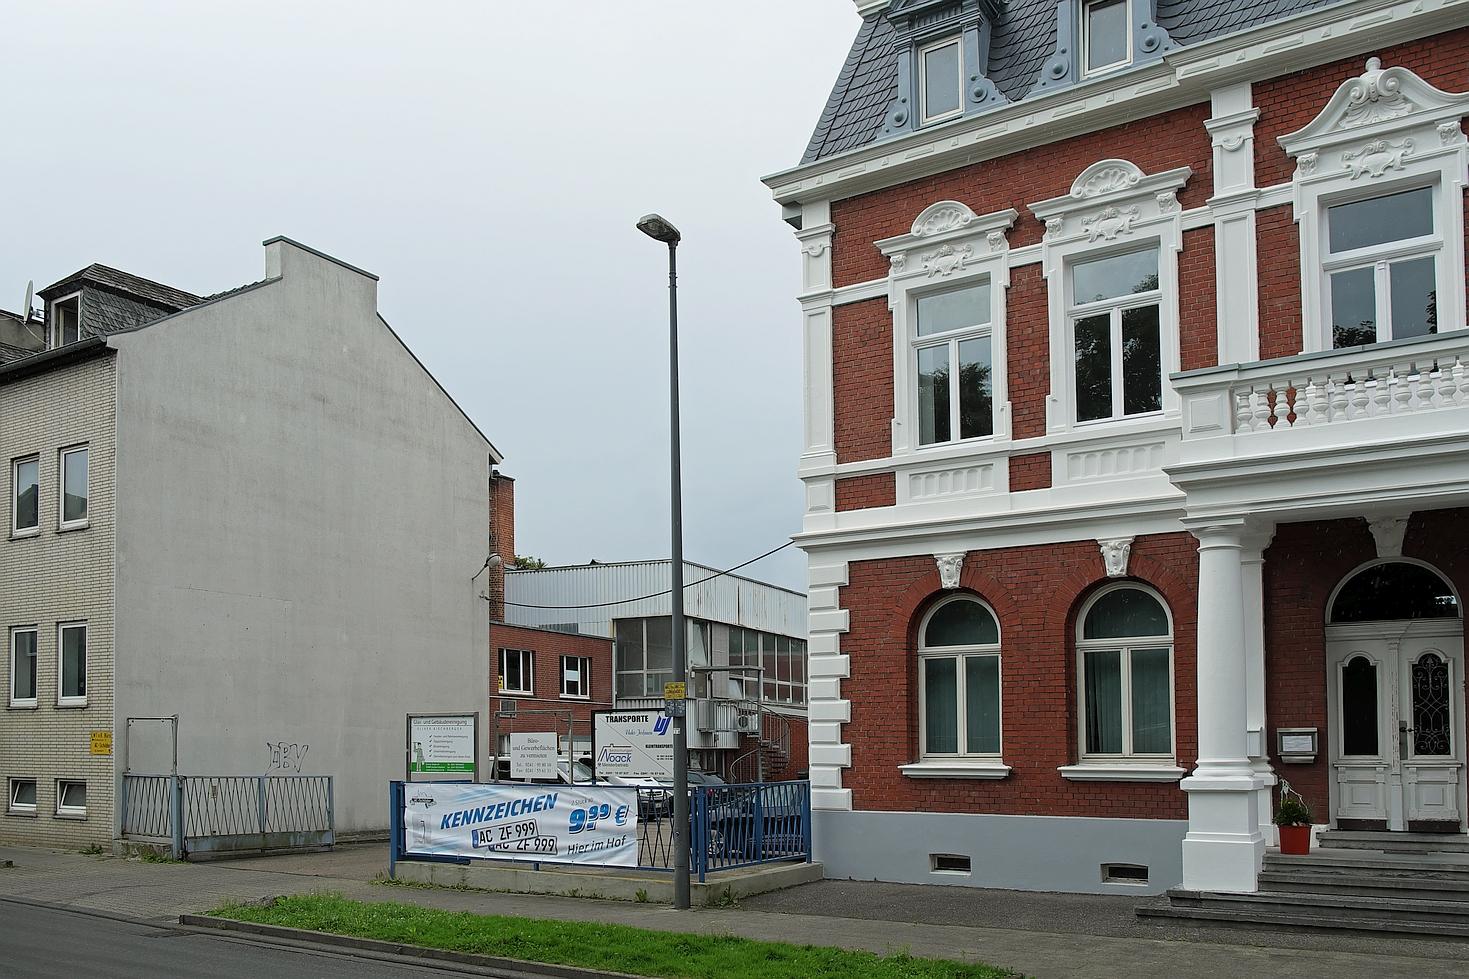 2016-07-15 ehem. Tuchfabrik Königsberger